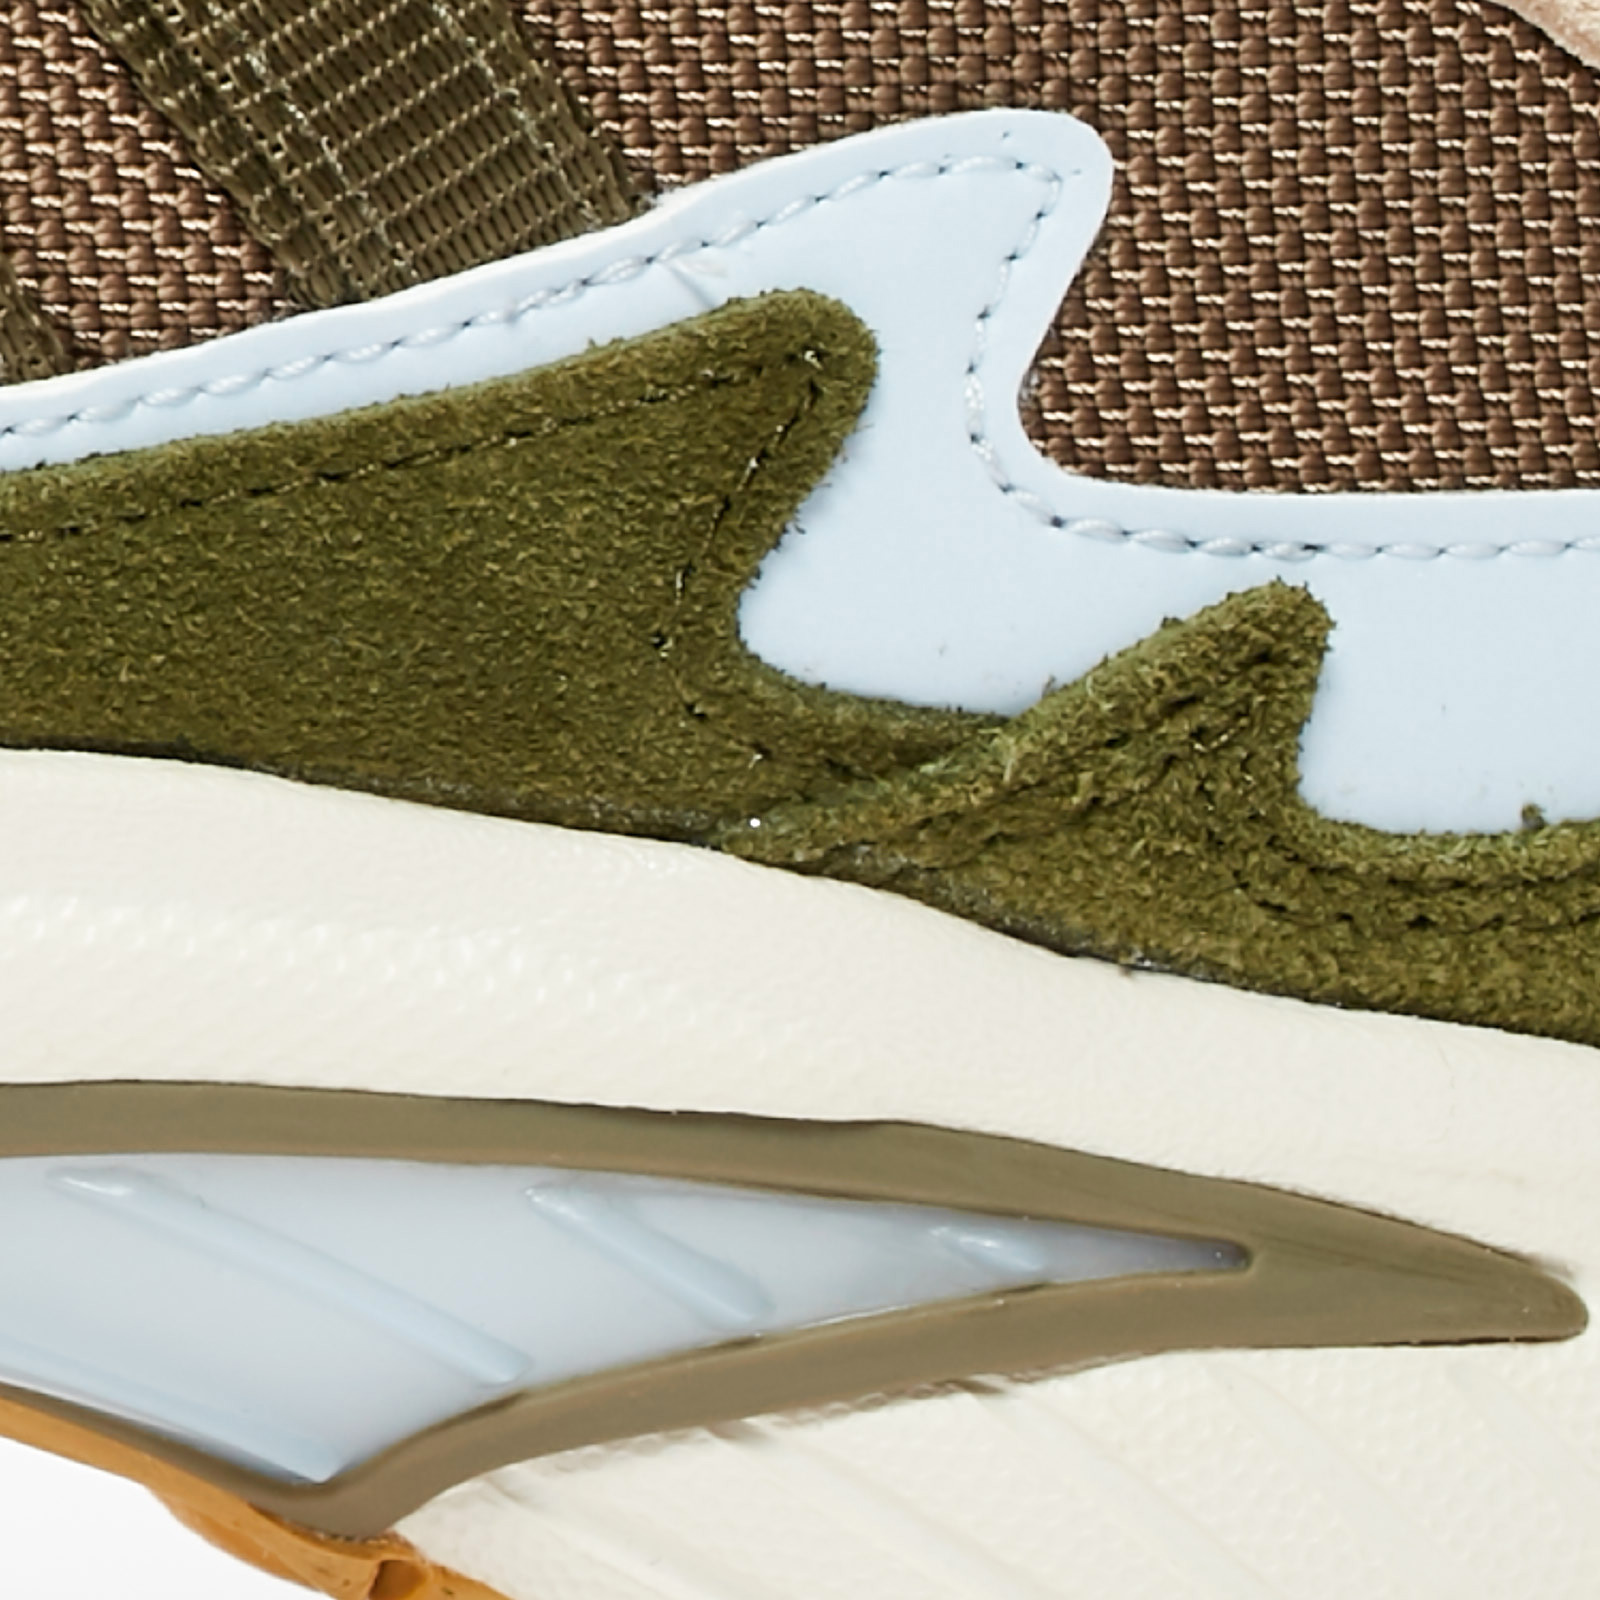 new style 0aa57 7e6c6 adidas Temper Run x St. Alfred - Bd8043 - Sneakersnstuff ...